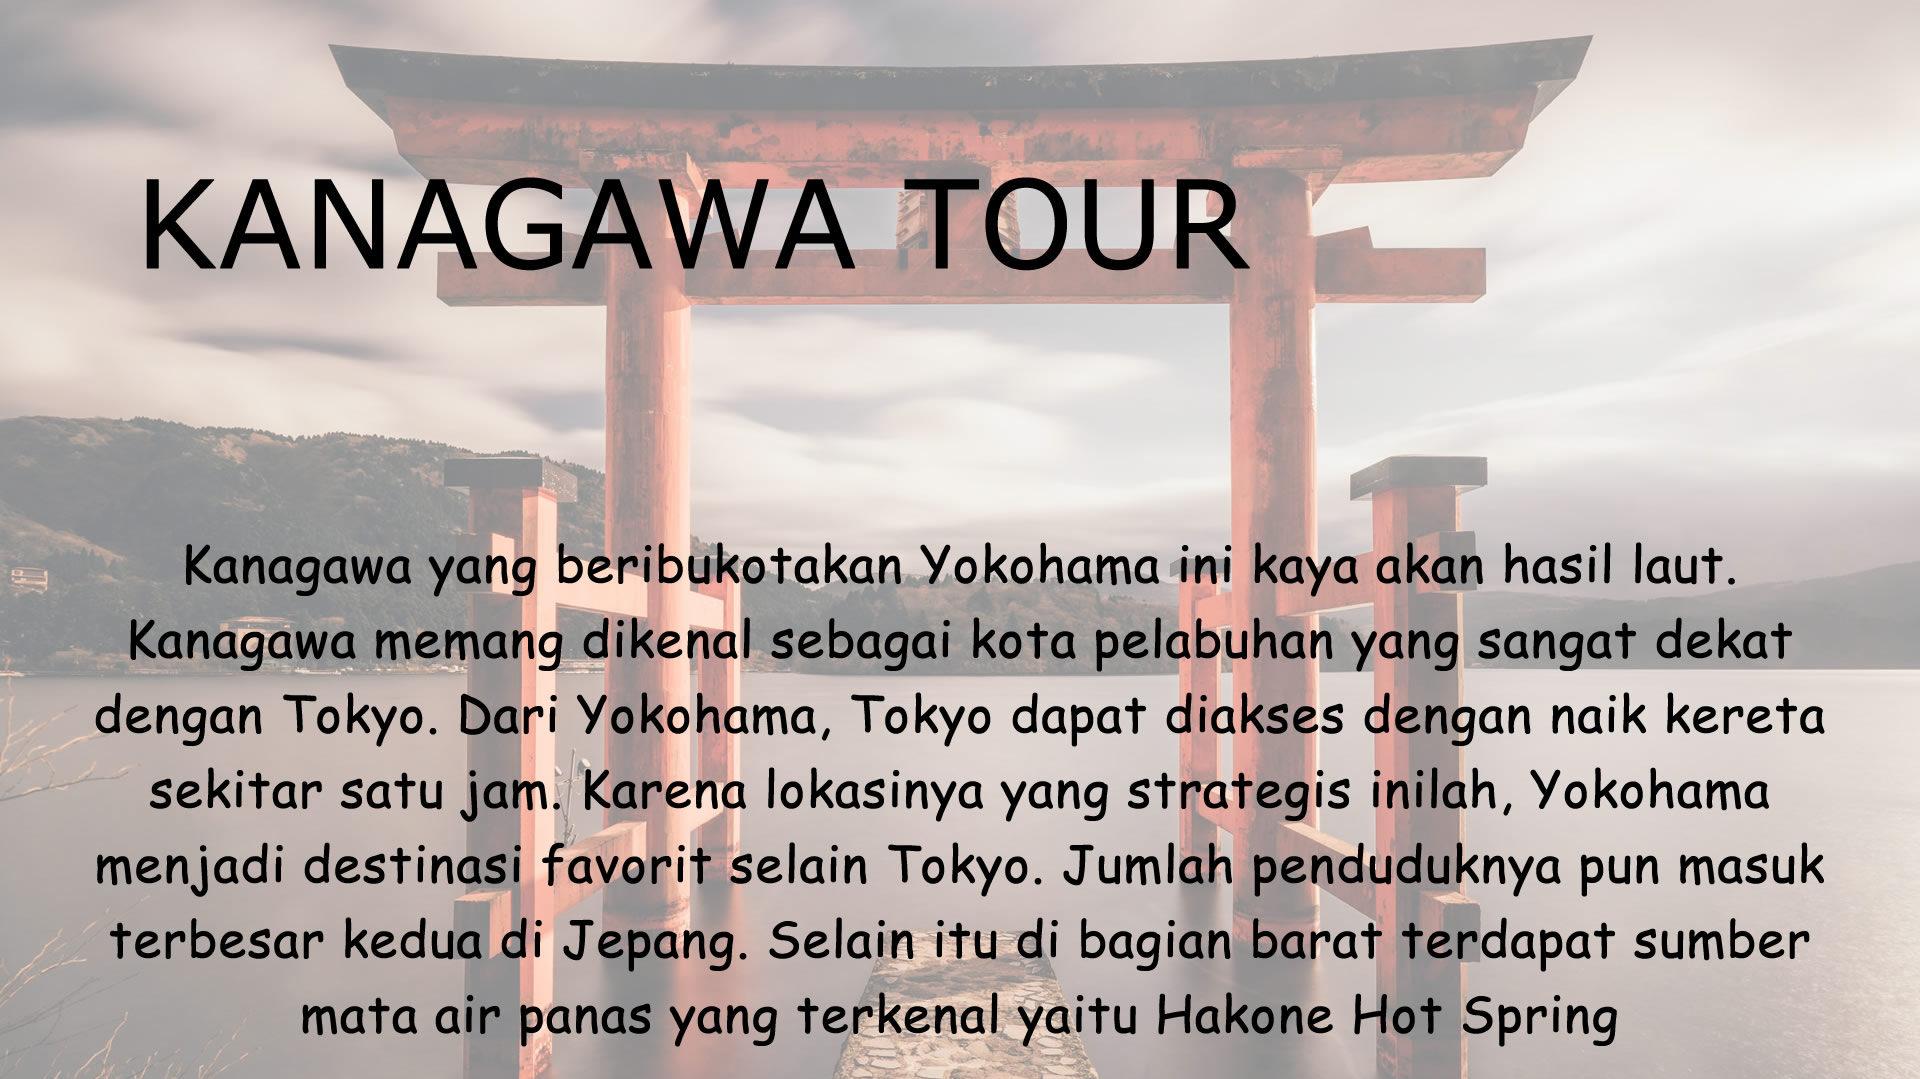 Kanagawa yang beribukotakan Yokohama ini kaya akan hasil laut. Kanagawa memang dikenal sebagai kota pelabuhan yang sangat dekat dengan Tokyo. Dari Yokohama, Tokyo dapat diakses dengan naik kereta sekitar satu jam. Karena lokasinya yang strategis inilah, Yokohama menjadi destinasi favorit selain Tokyo. Jumlah penduduknya pun masuk terbesar kedua di Jepang. Selain itu di bagian barat terdapat sumber mata air panas yang terkenal yaitu Hakone Hot Spring